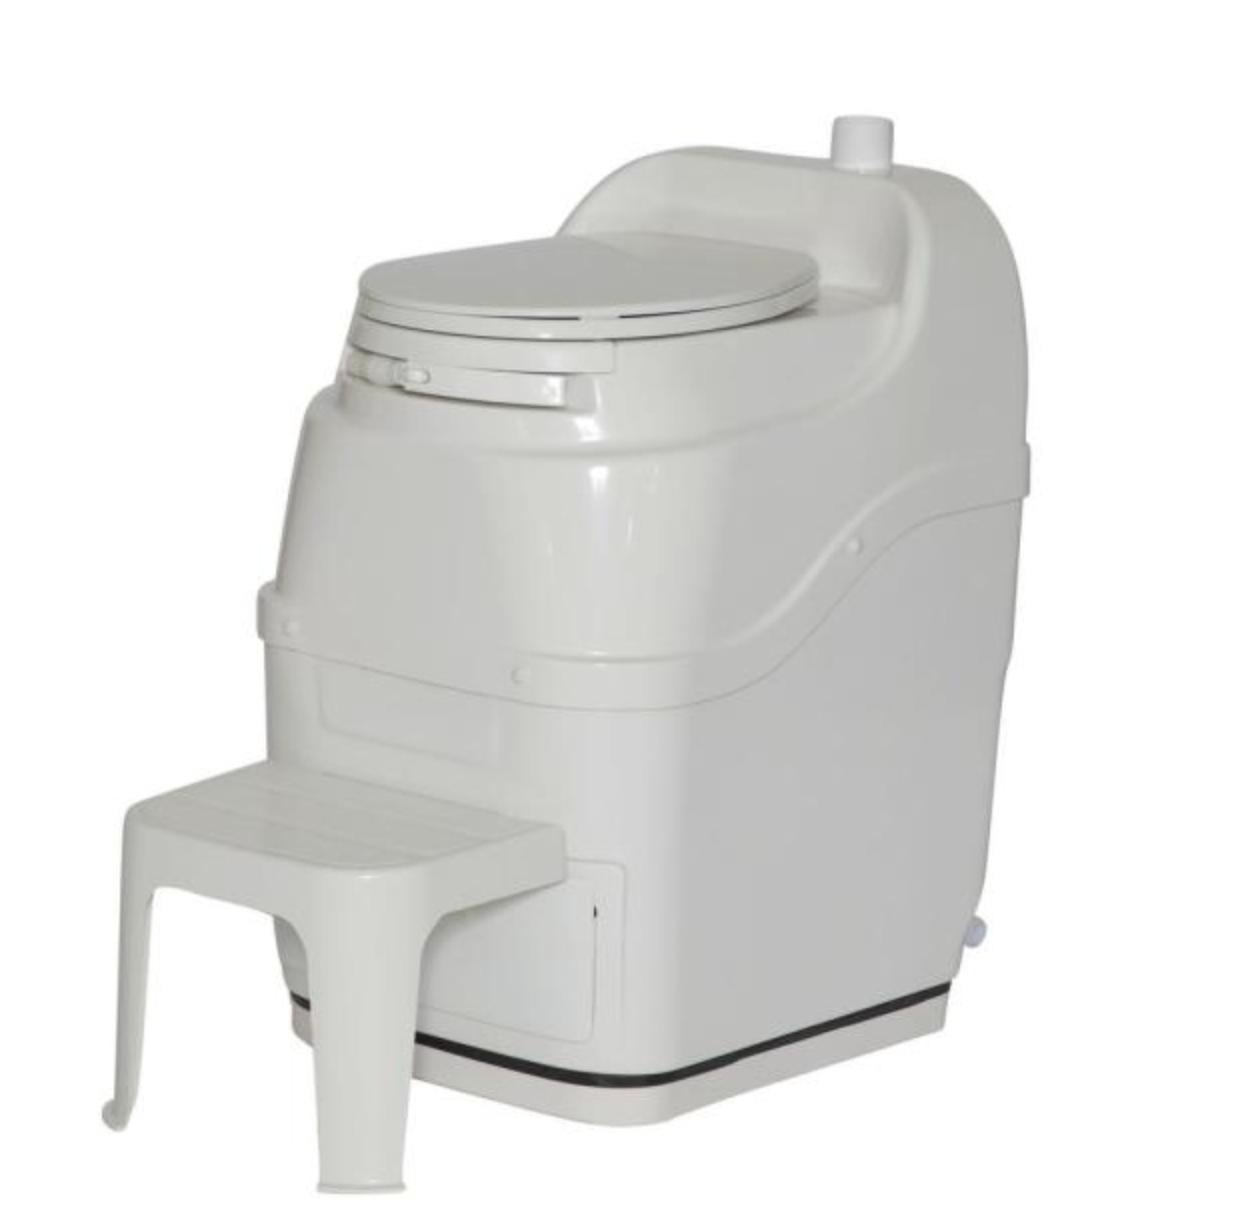 Sun-Mar Spacesaver Electric Composting Toilet